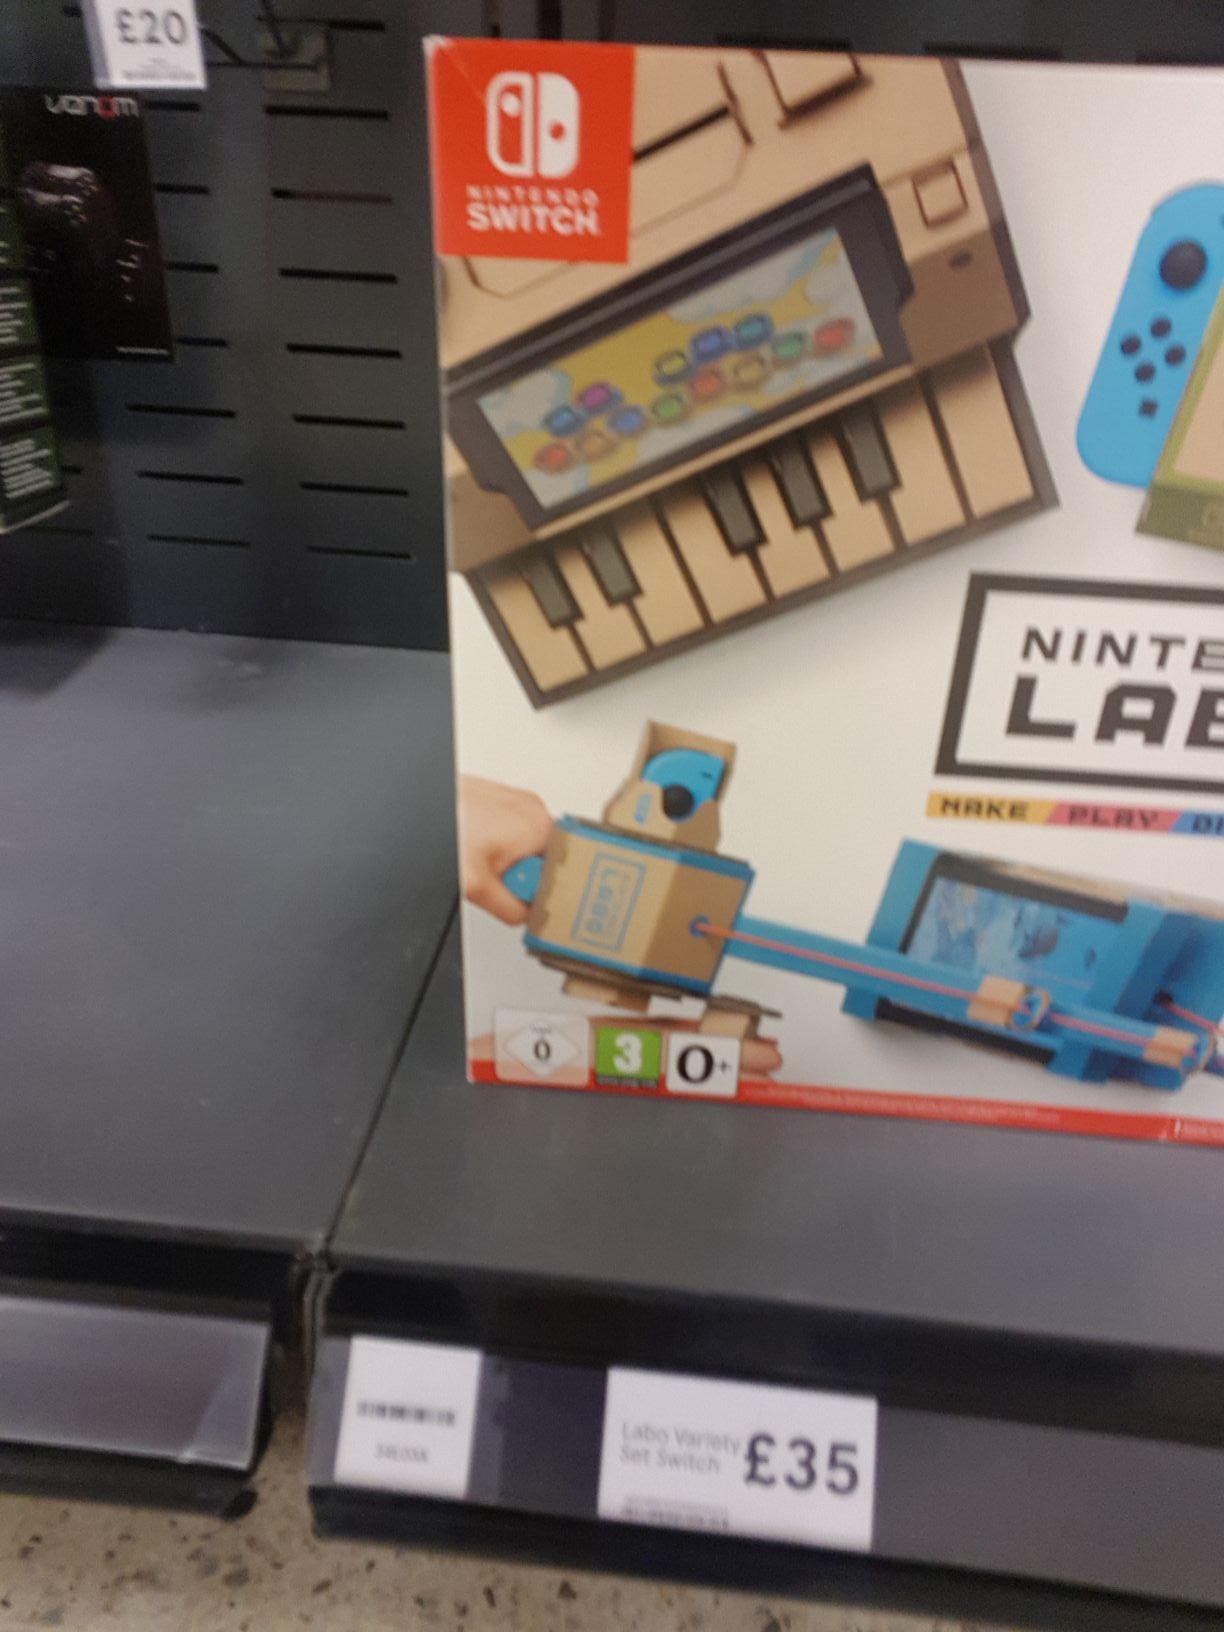 Instore Tesco Bangor NI. Nintendo Labo Variety kit £35